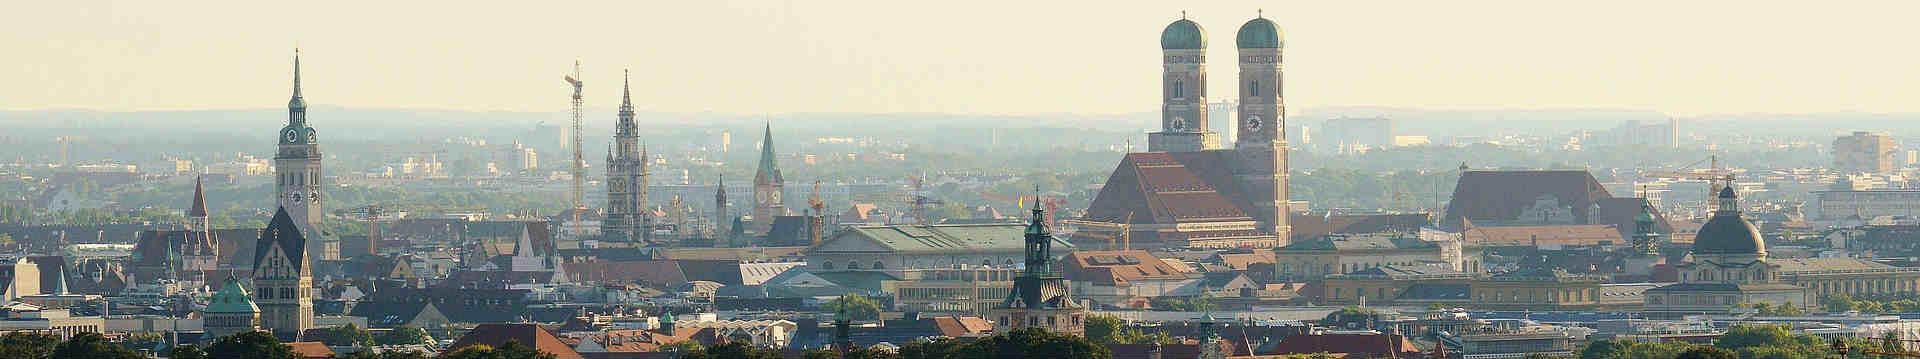 Munich desde Asturias. Semana Santa